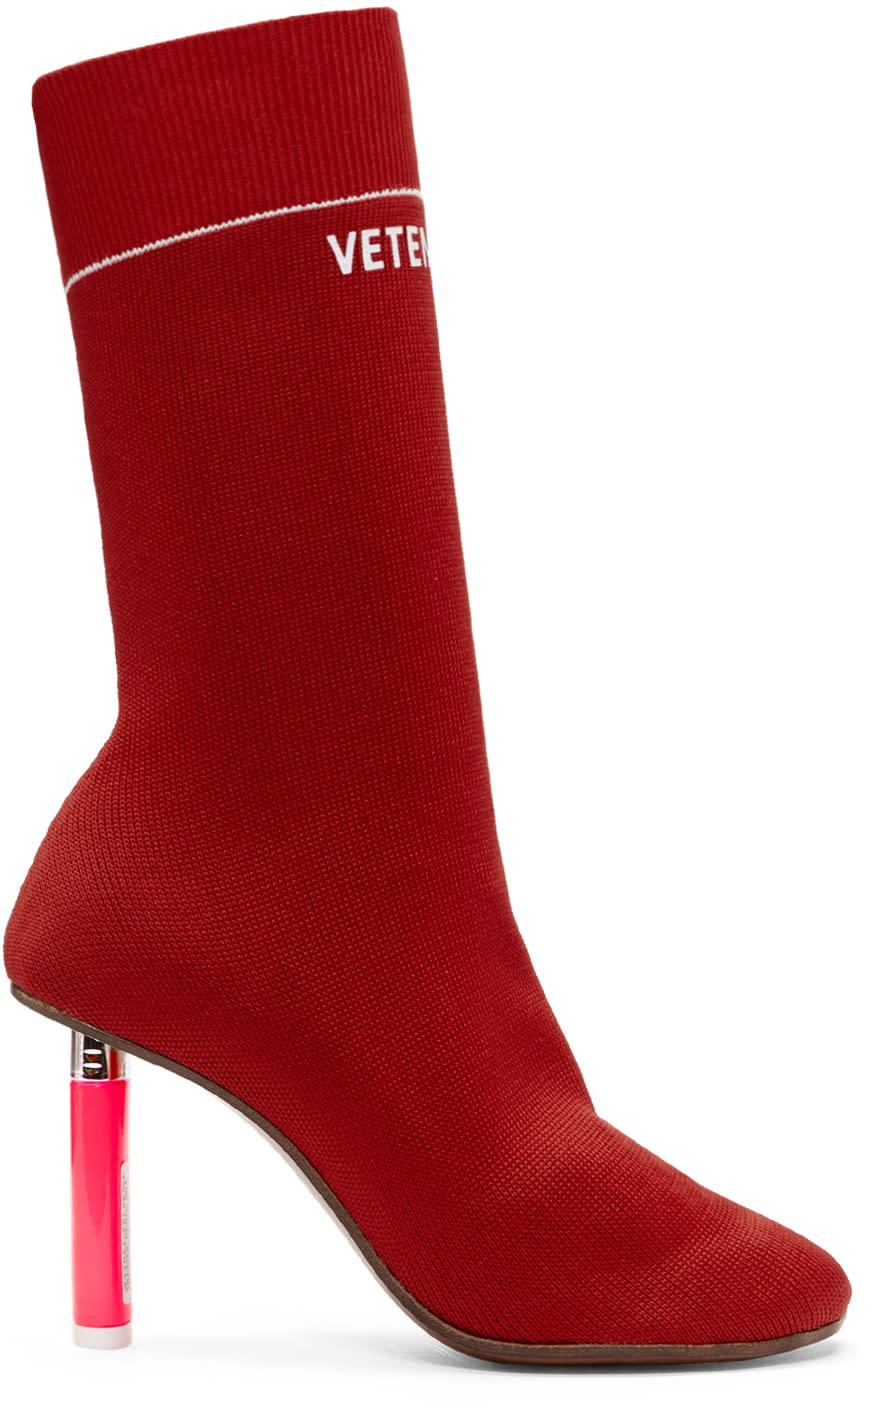 Vetements-Red Lighter Sock Boots